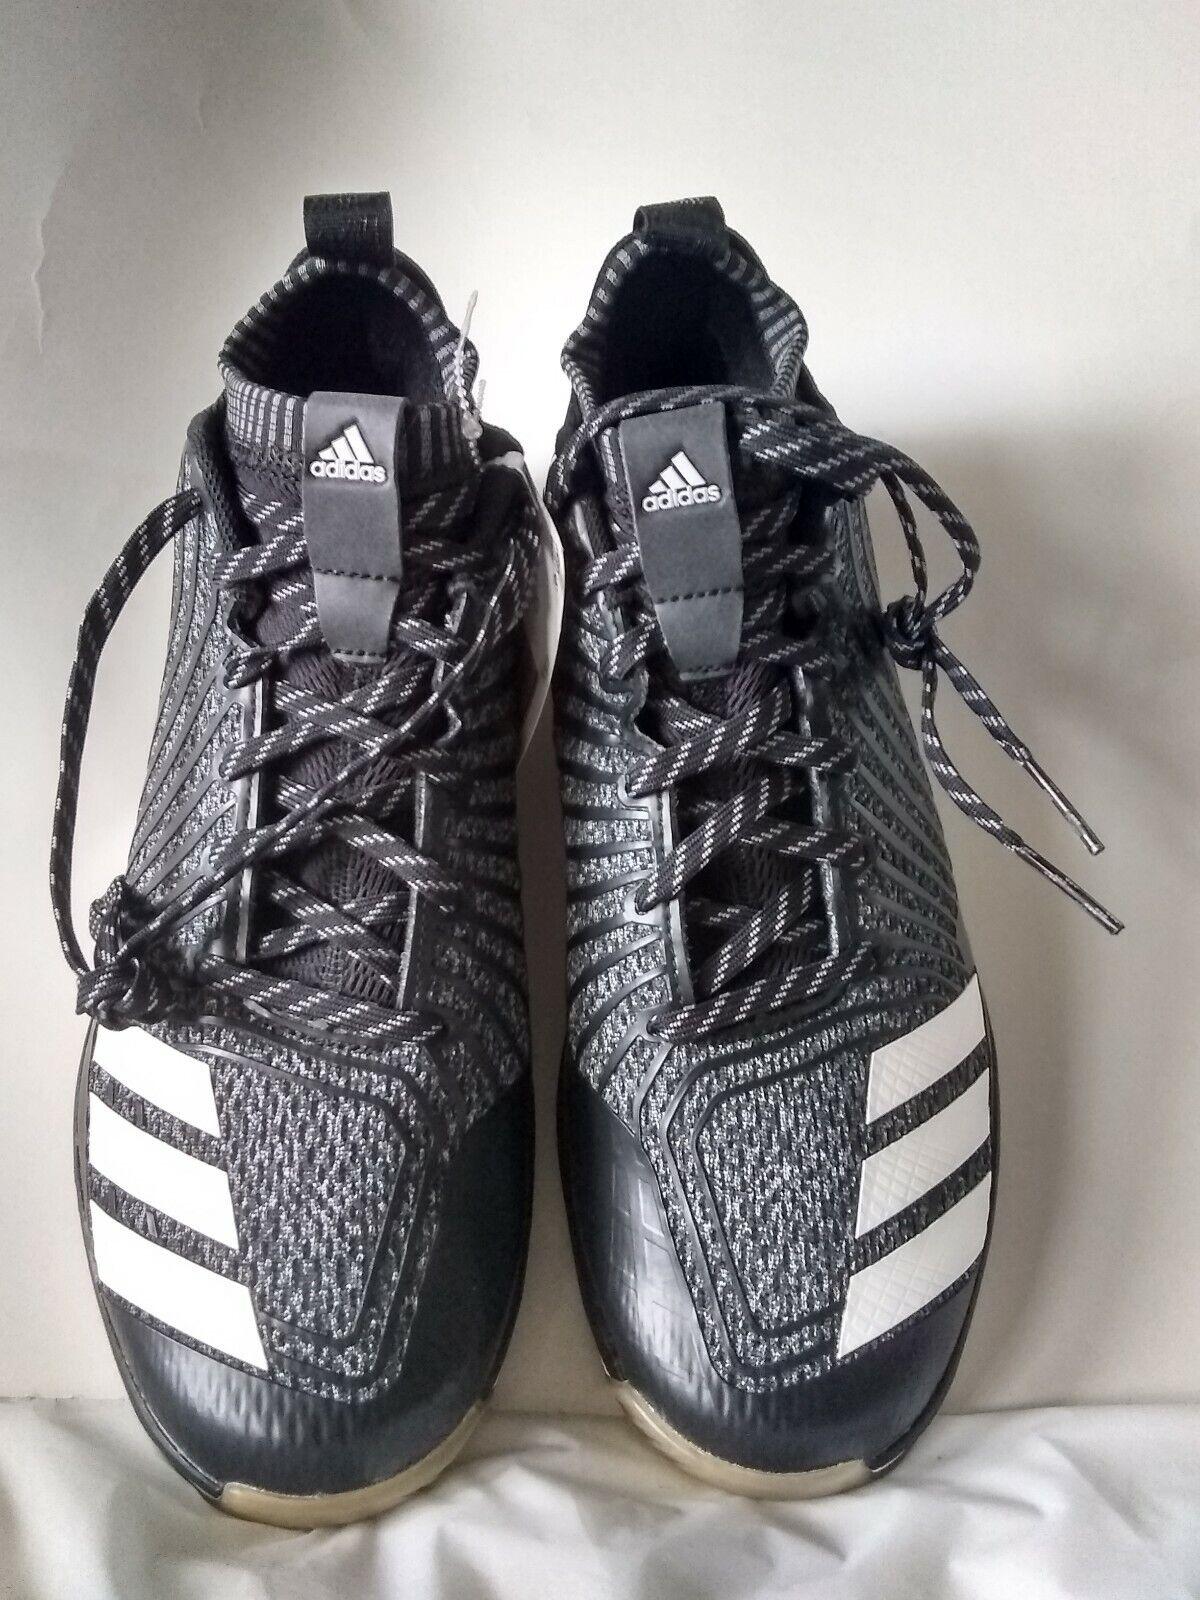 Adidas Icon Trainer AC 8472 Onix  white black Running Shous men's US 10